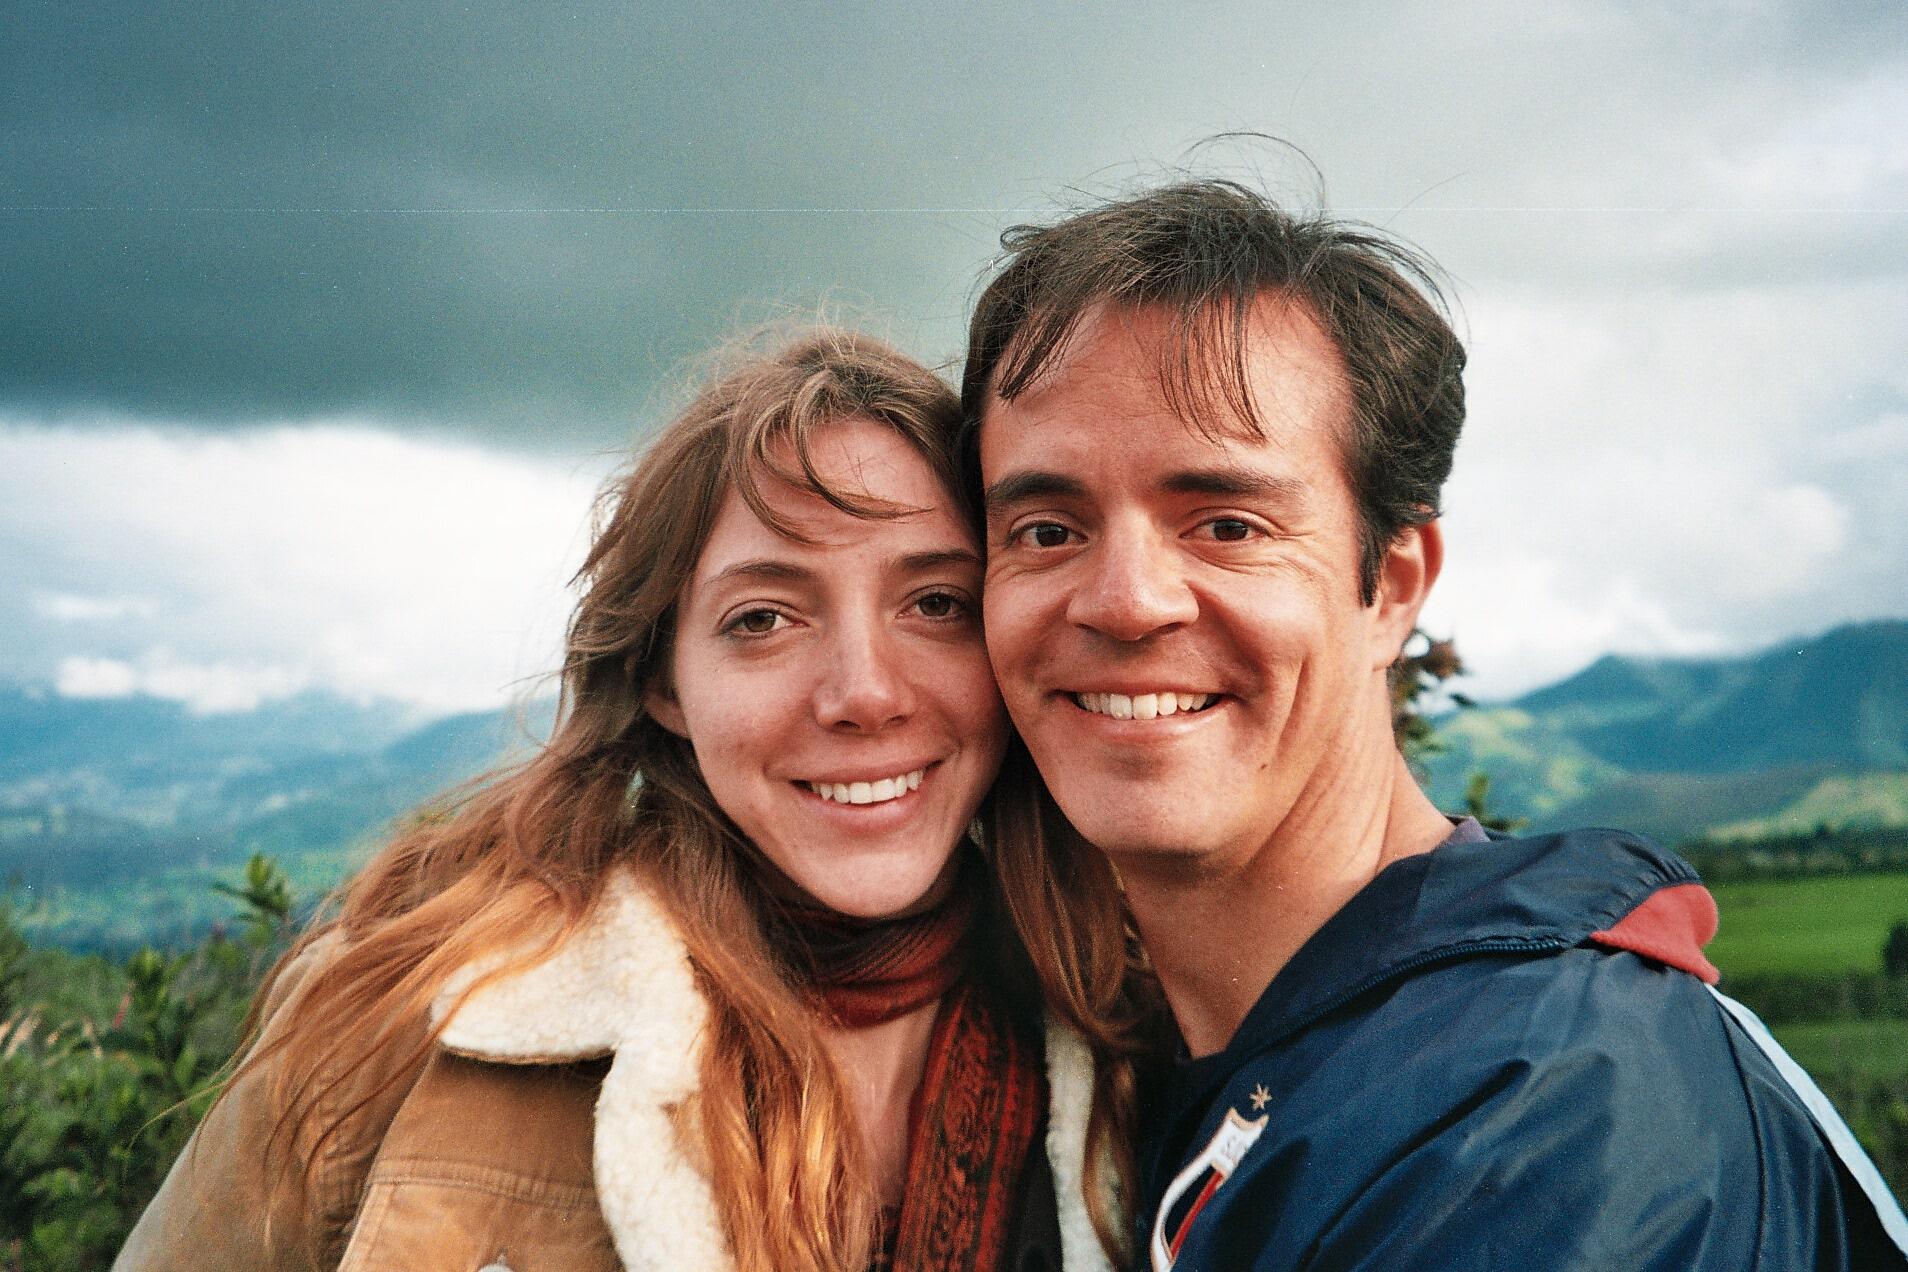 Martin & Natalie